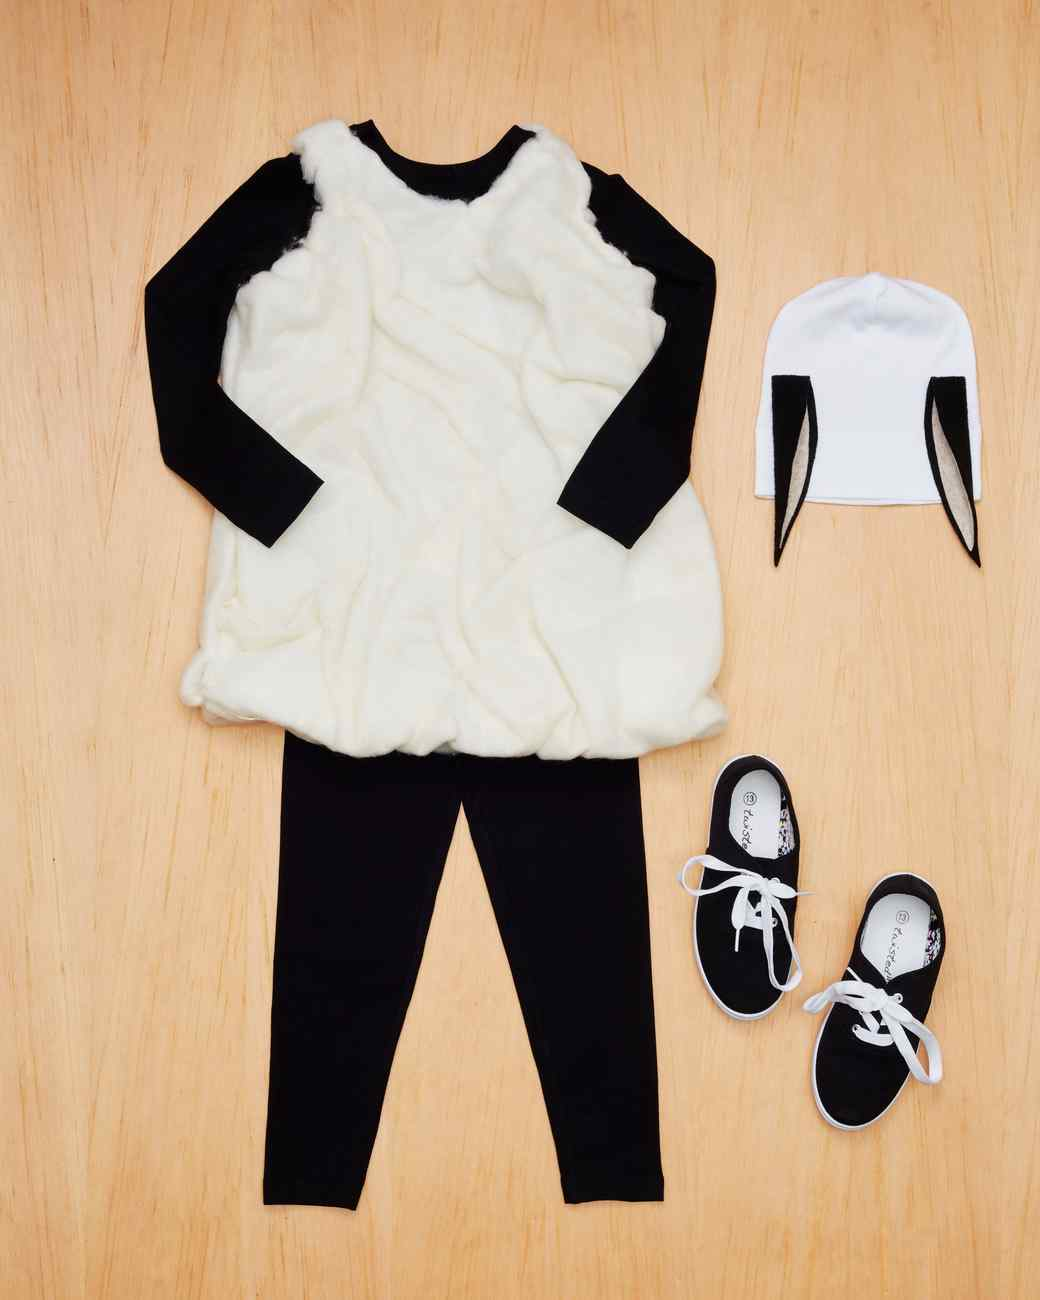 lamb costume materials